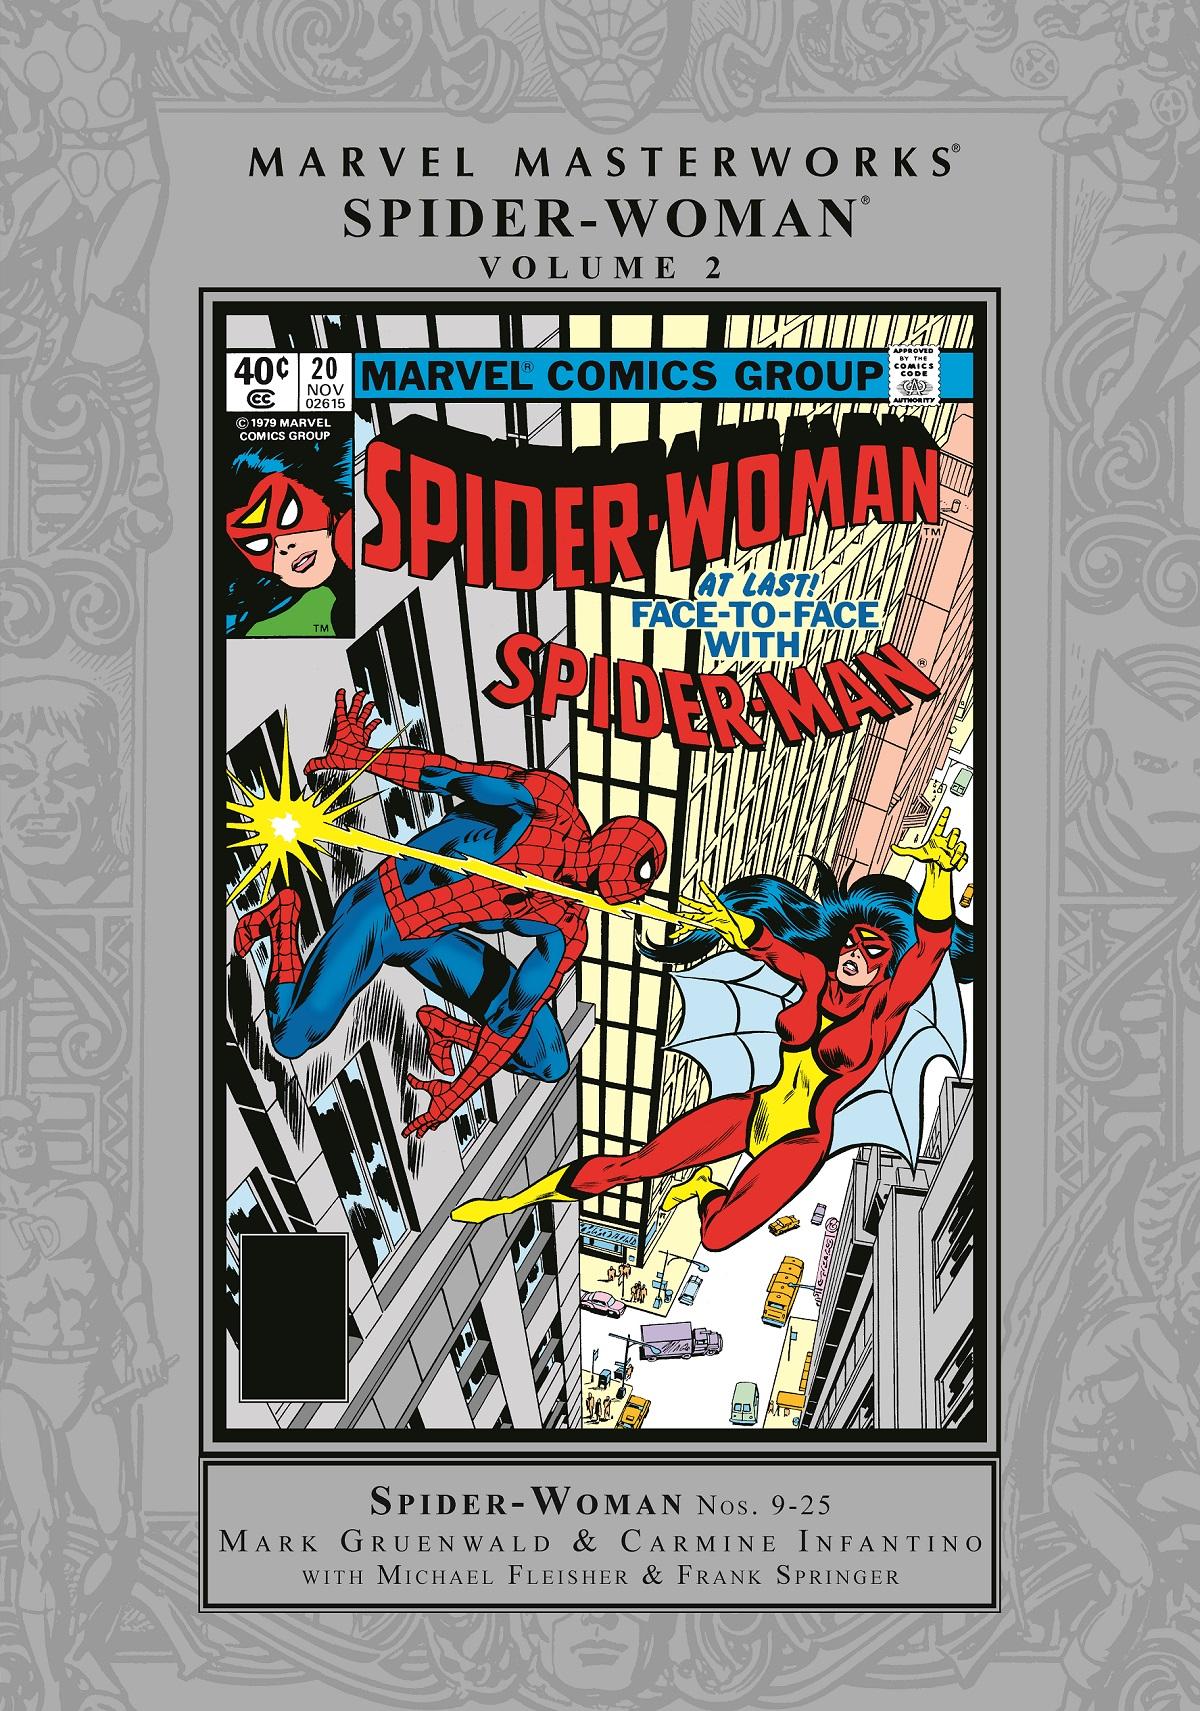 Marvel Masterworks: Spider-Woman Vol. 2 (Hardcover)